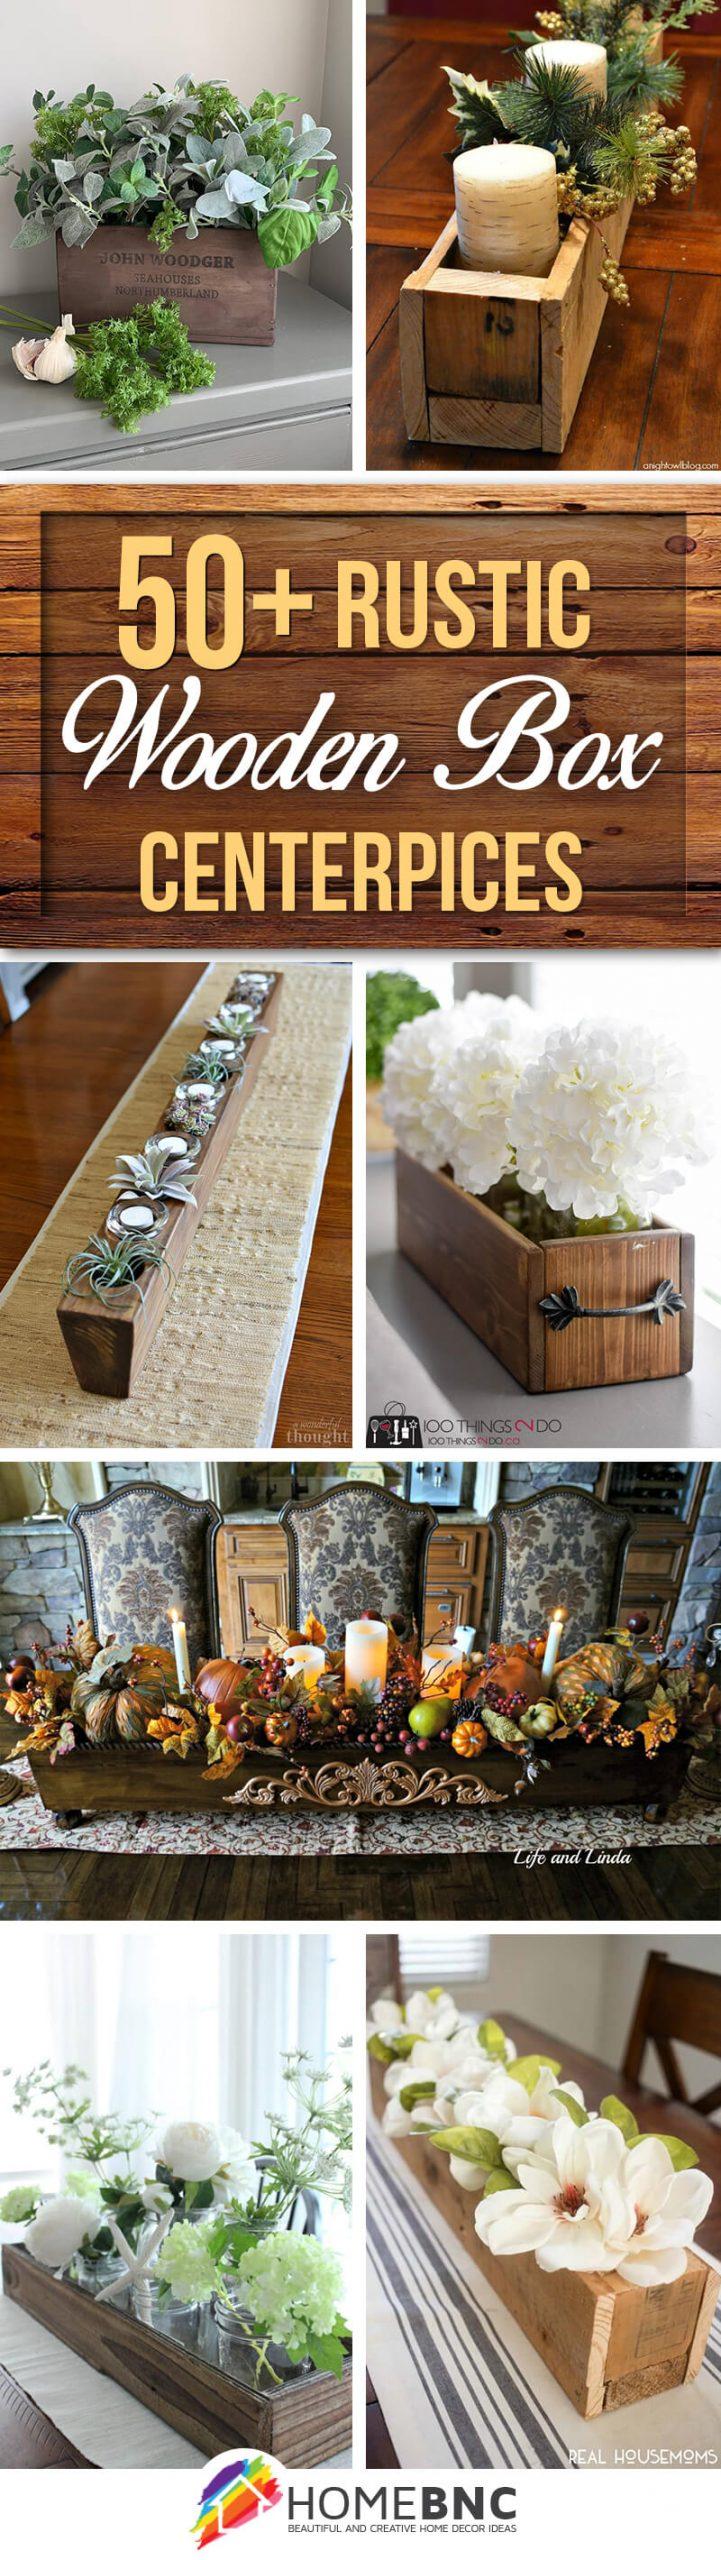 Rustic Wooden Box Centerpiece Ideas